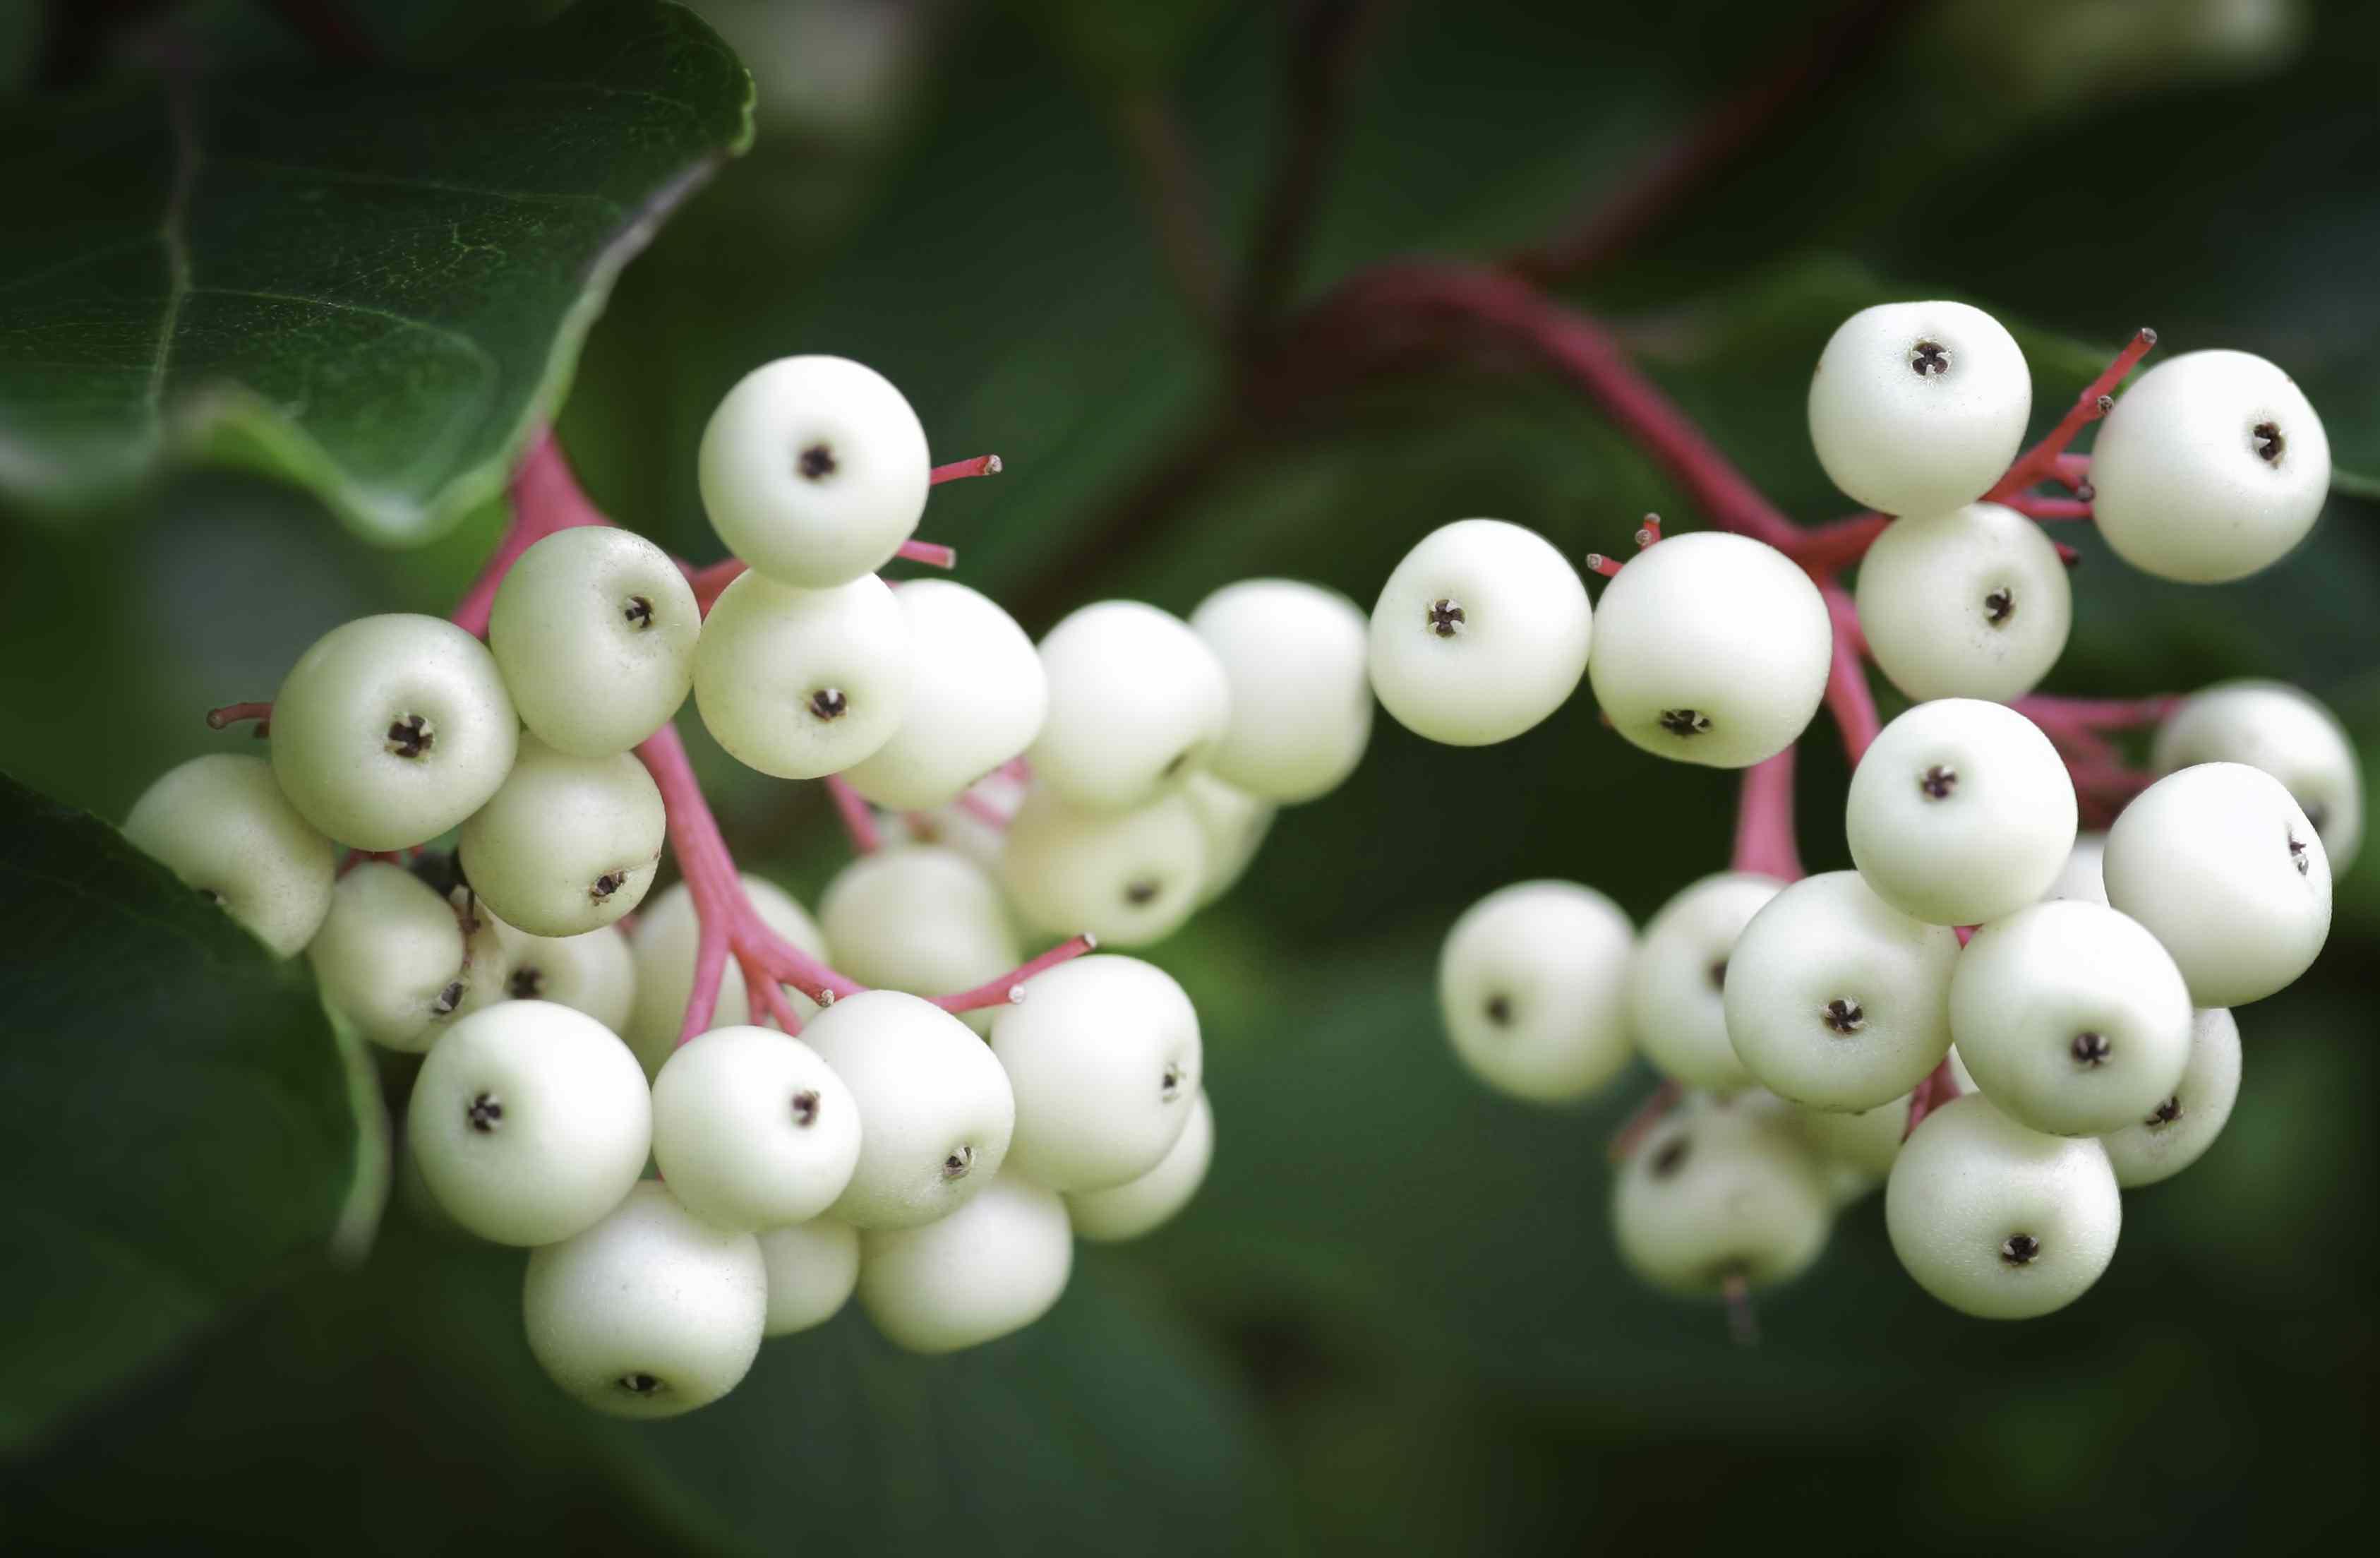 Berries of the grey dogwood (Cornus racemosa)